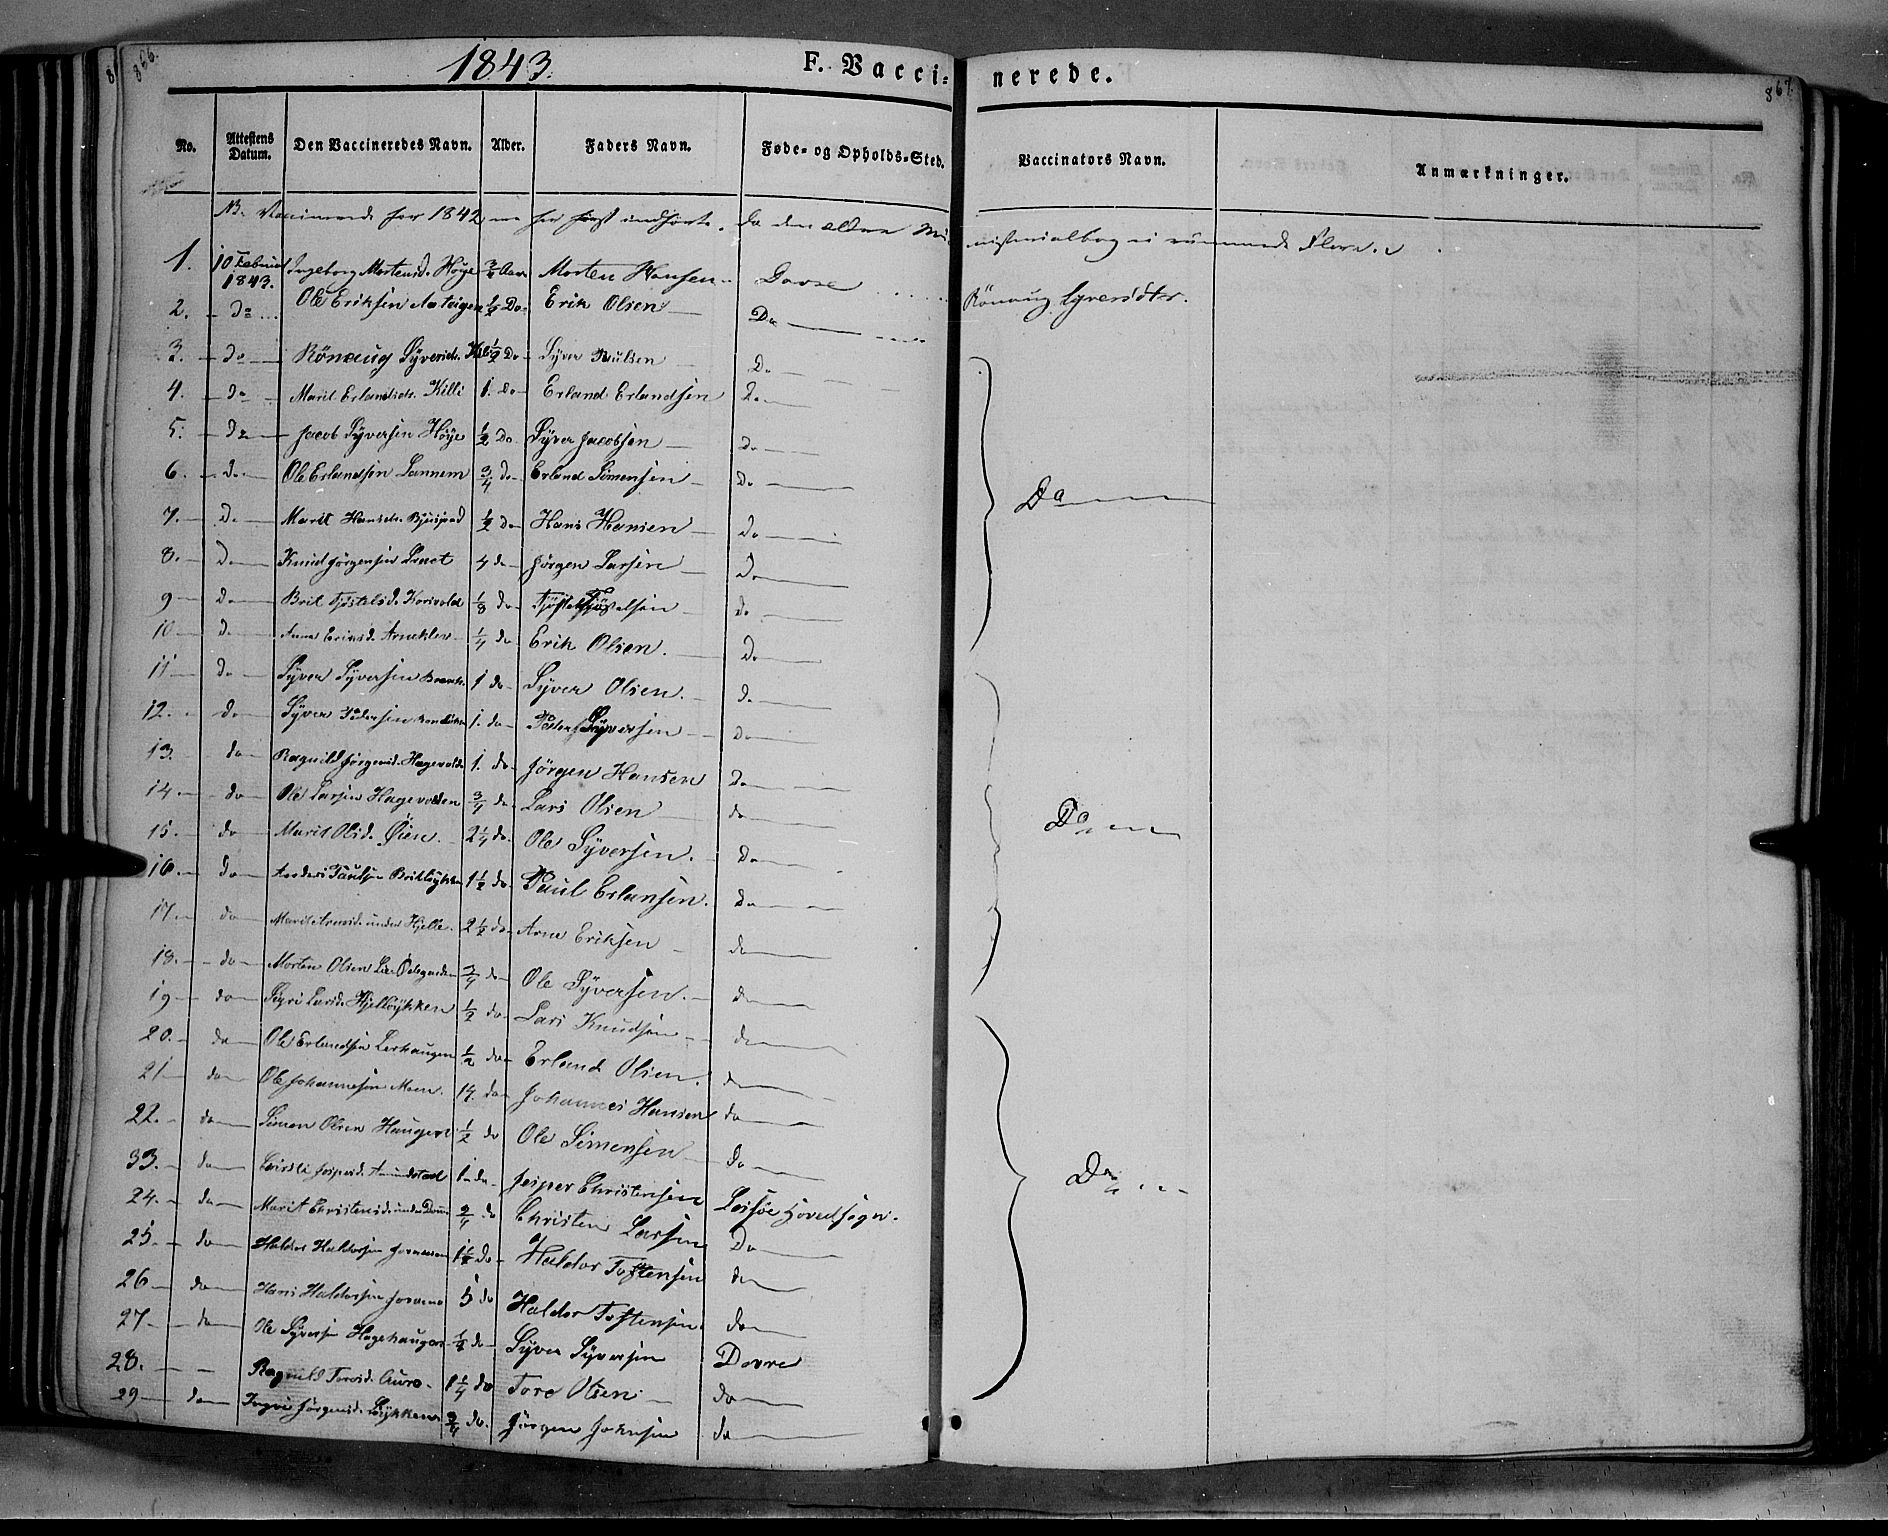 SAH, Lesja prestekontor, Ministerialbok nr. 6B, 1843-1854, s. 866-867